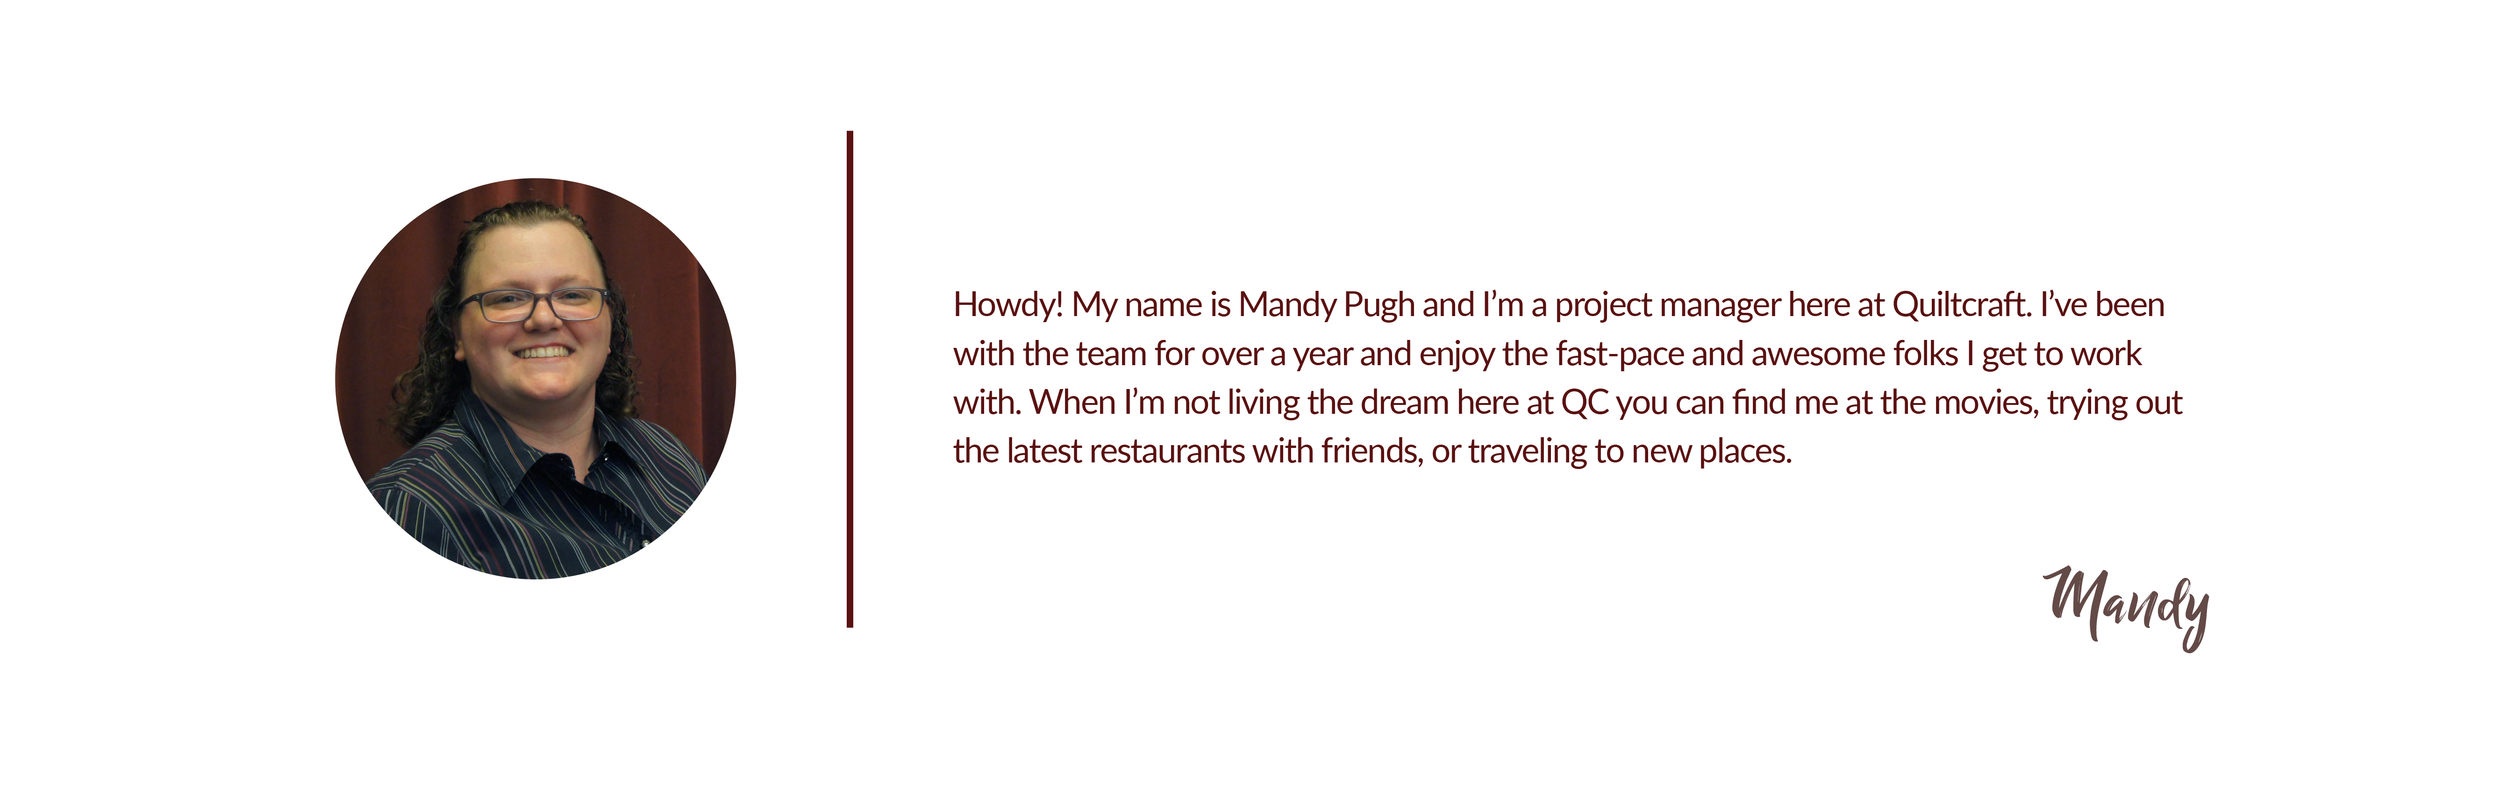 Mandy-04.png